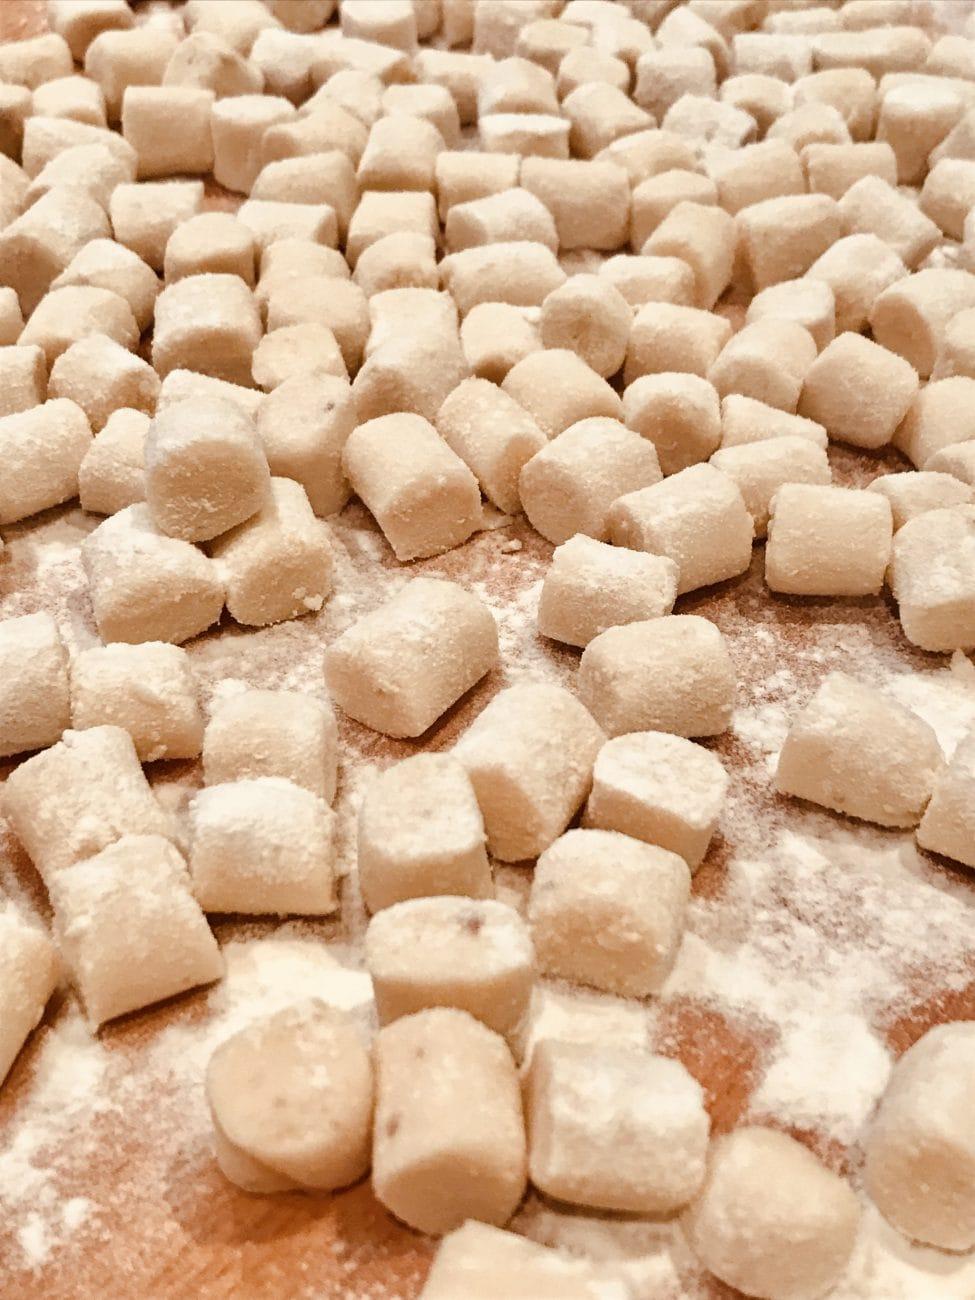 Potatoes Gnocchi with Rice flour